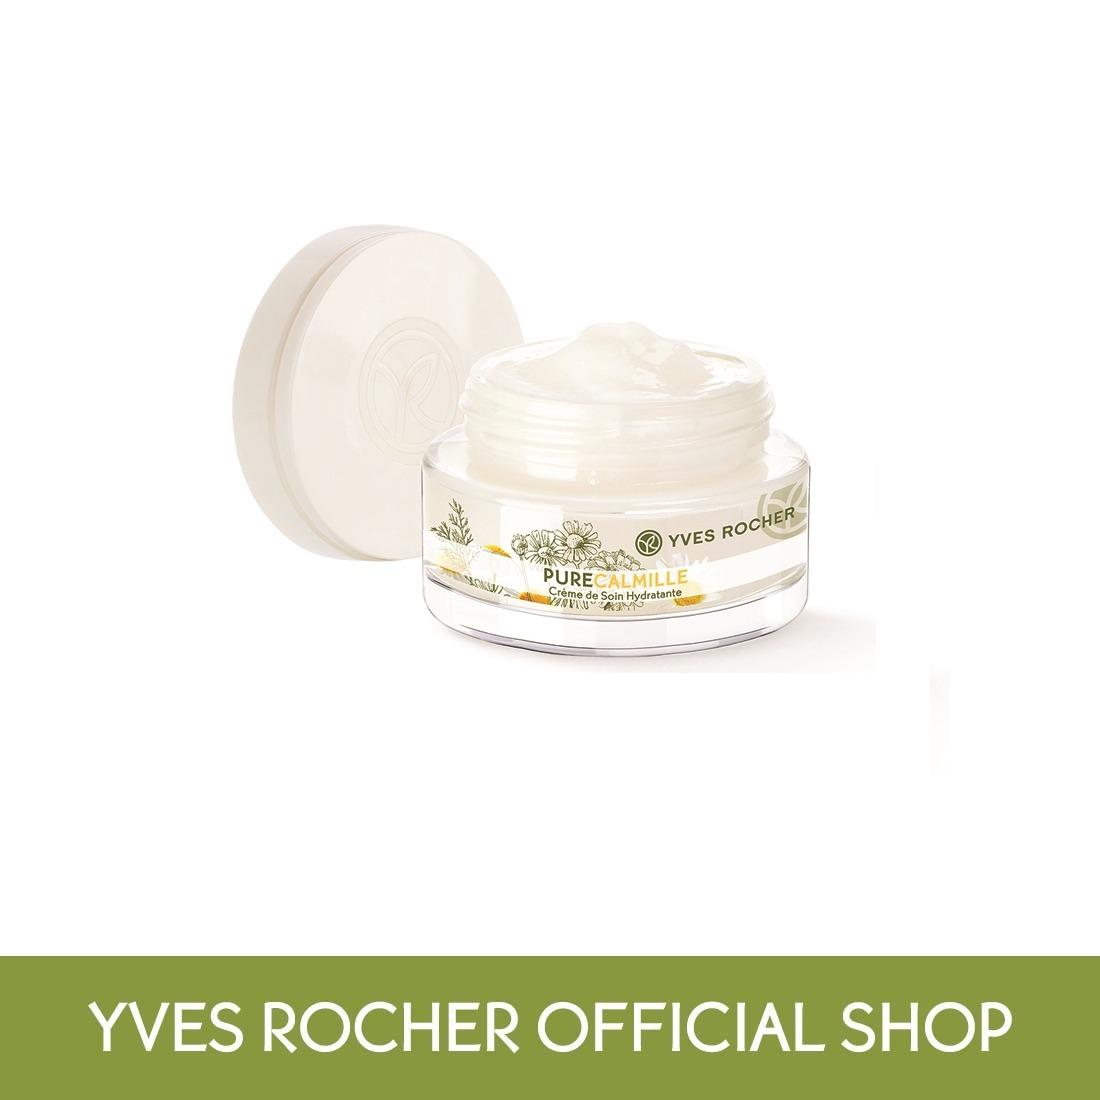 Yves Rocher Pure Calmille Day Night Moisturizing Face Cream 50ml By Yves Rocher Singapore (capitaland Merchant).